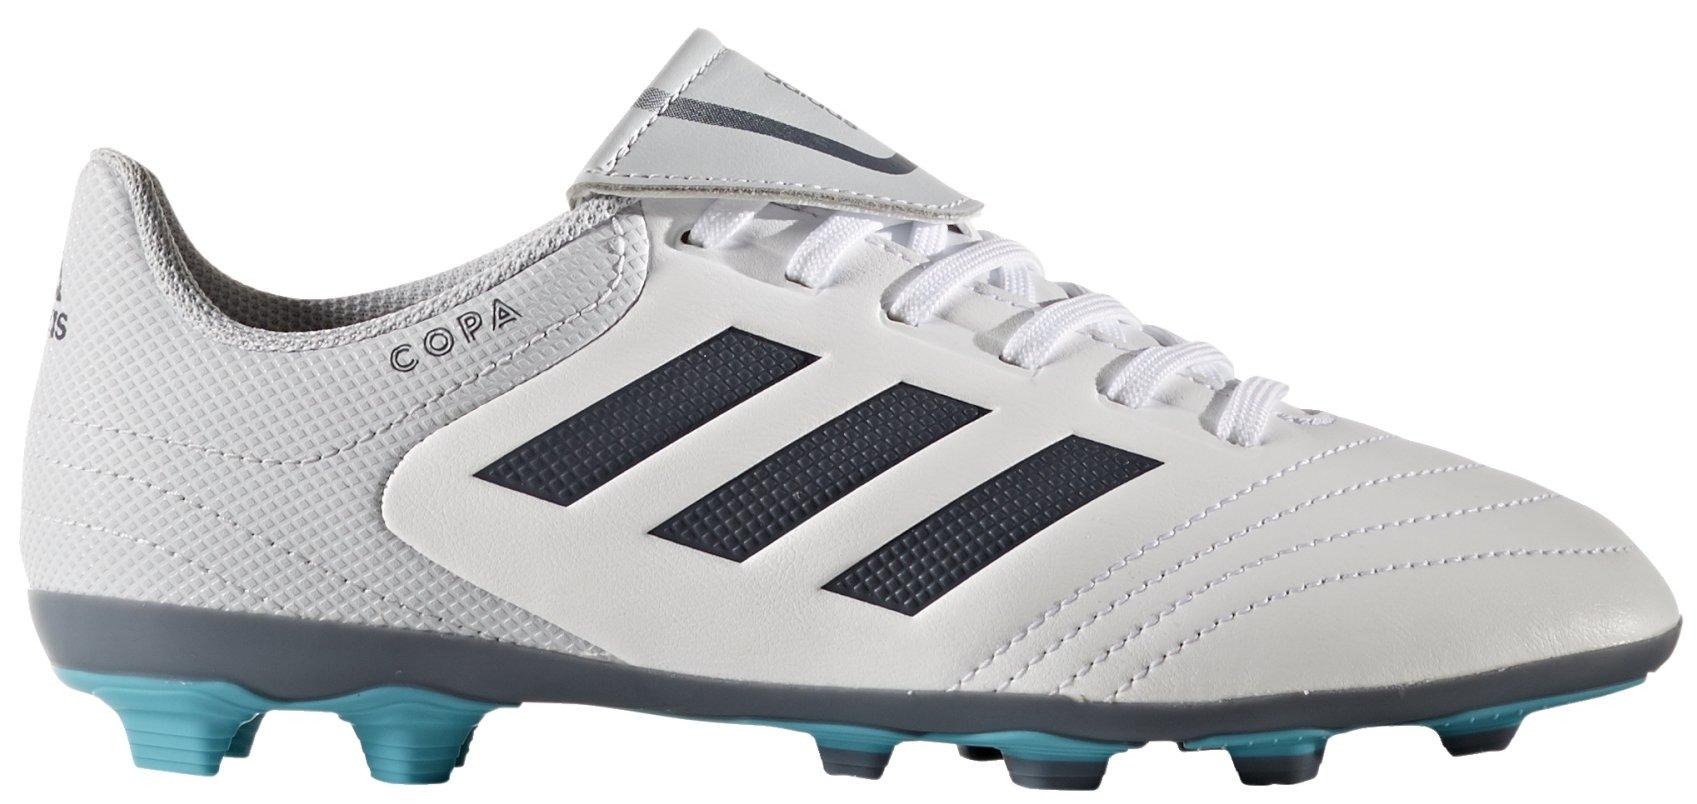 22cec3d557 Adidas Copa 17.4 Fxg - Glami.sk